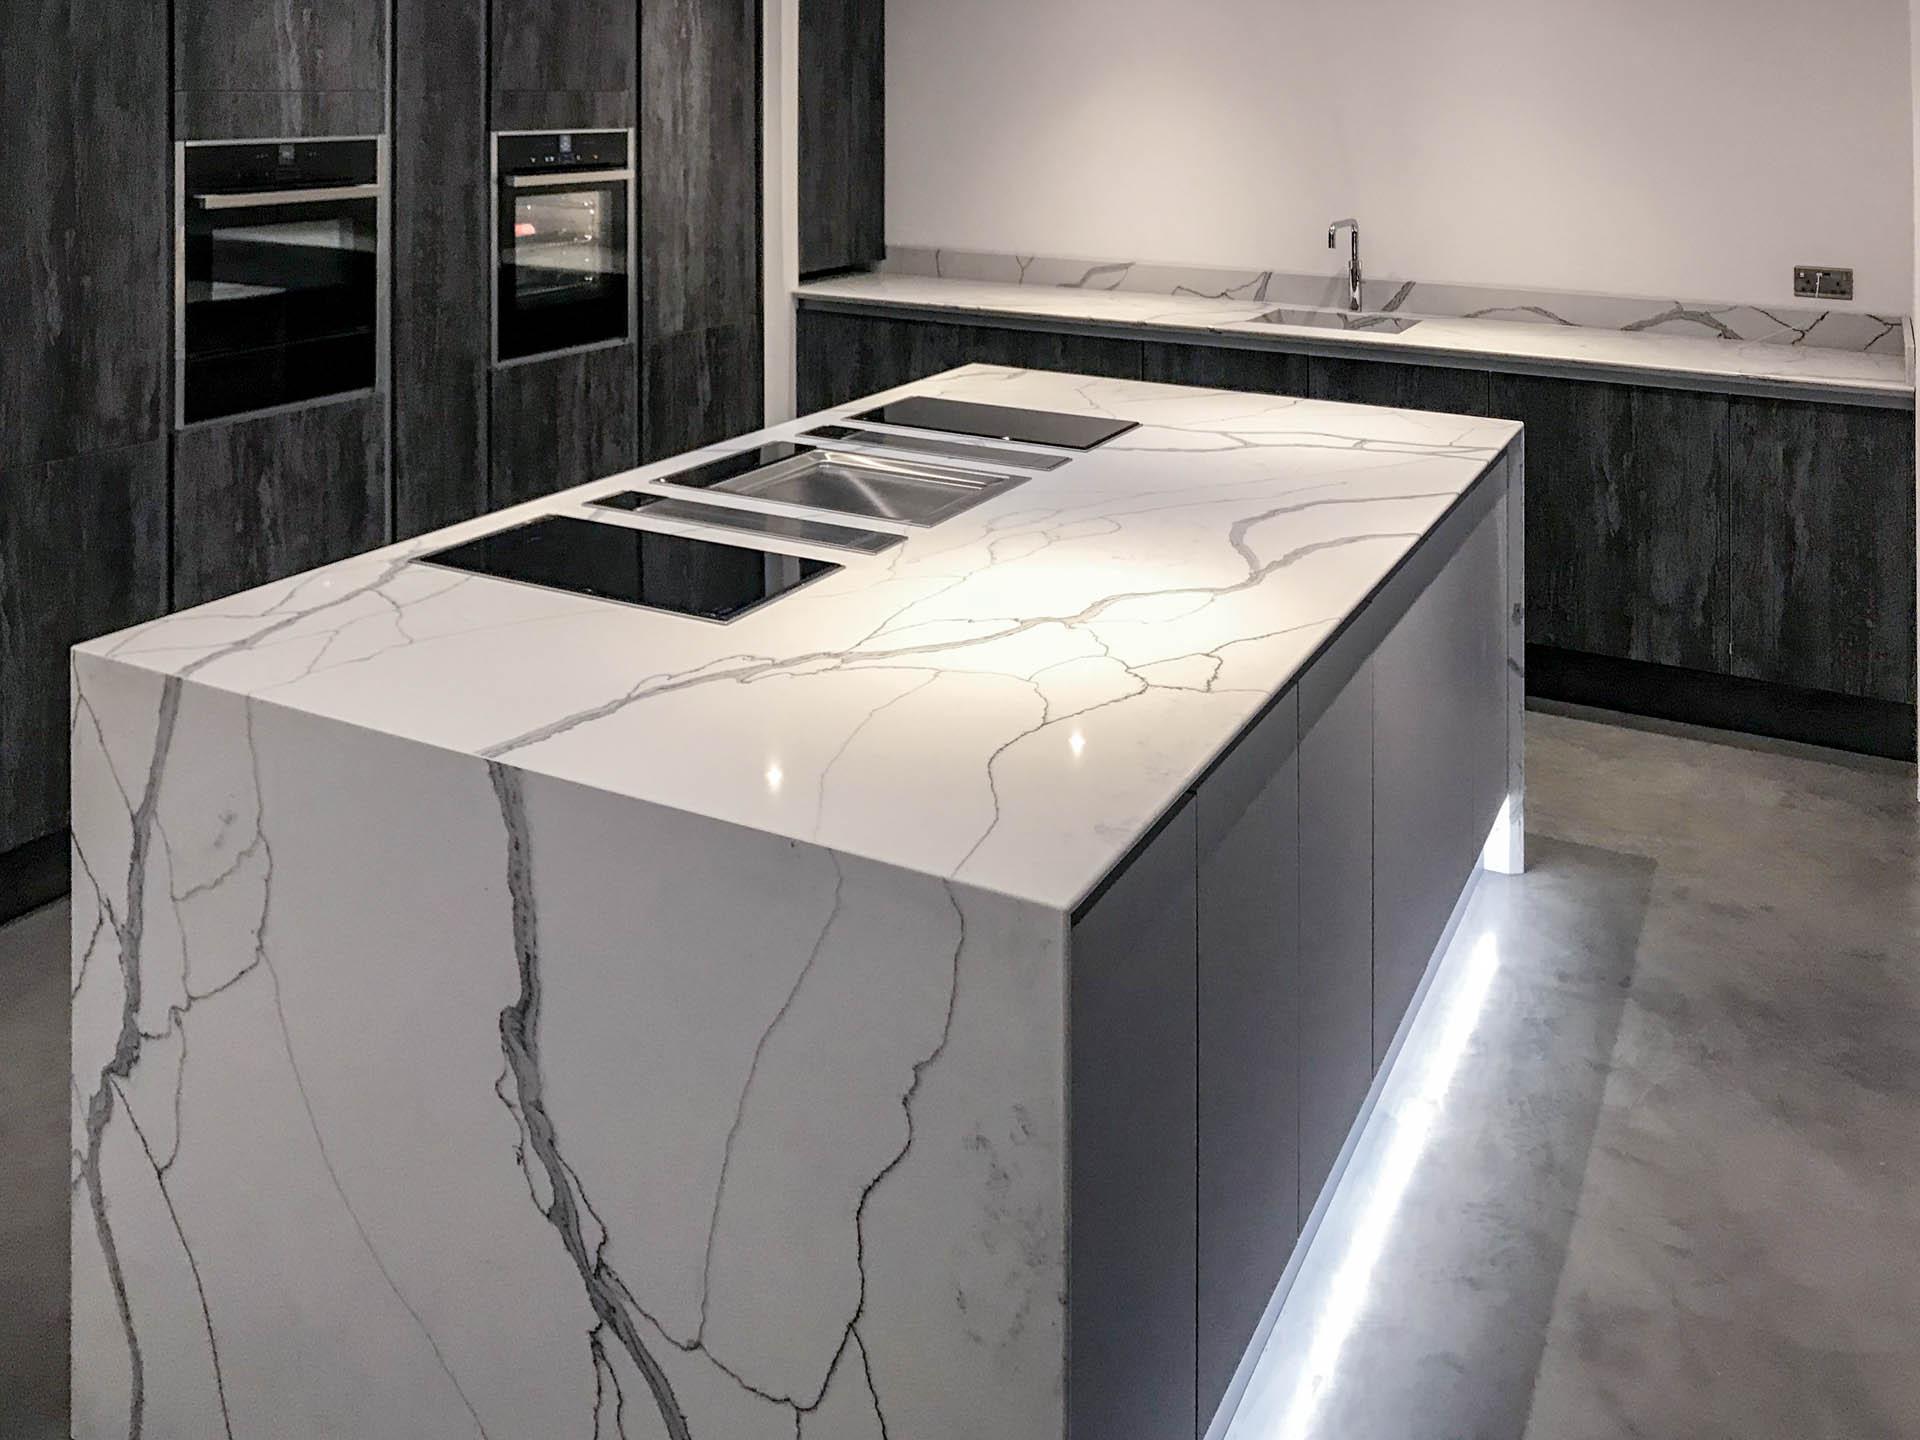 Classic quartz statuario venato house of building reigate affordable granite 201435 a